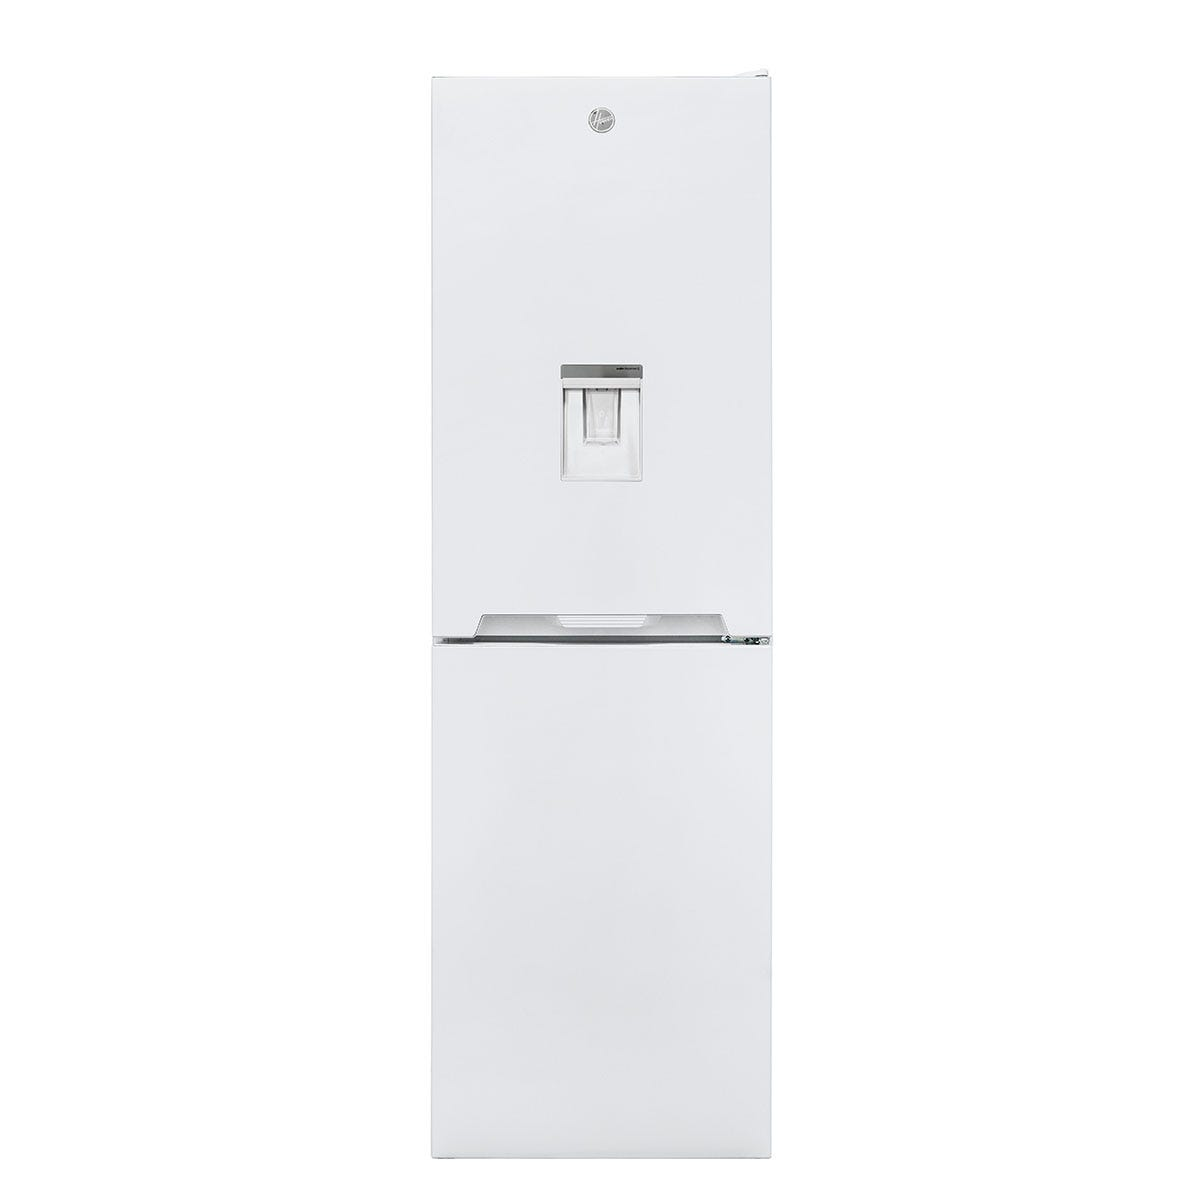 Hoover HOCV1S517FWWK 163L/114L Freestanding Static Fridge Freezer with Water Through The Door - White